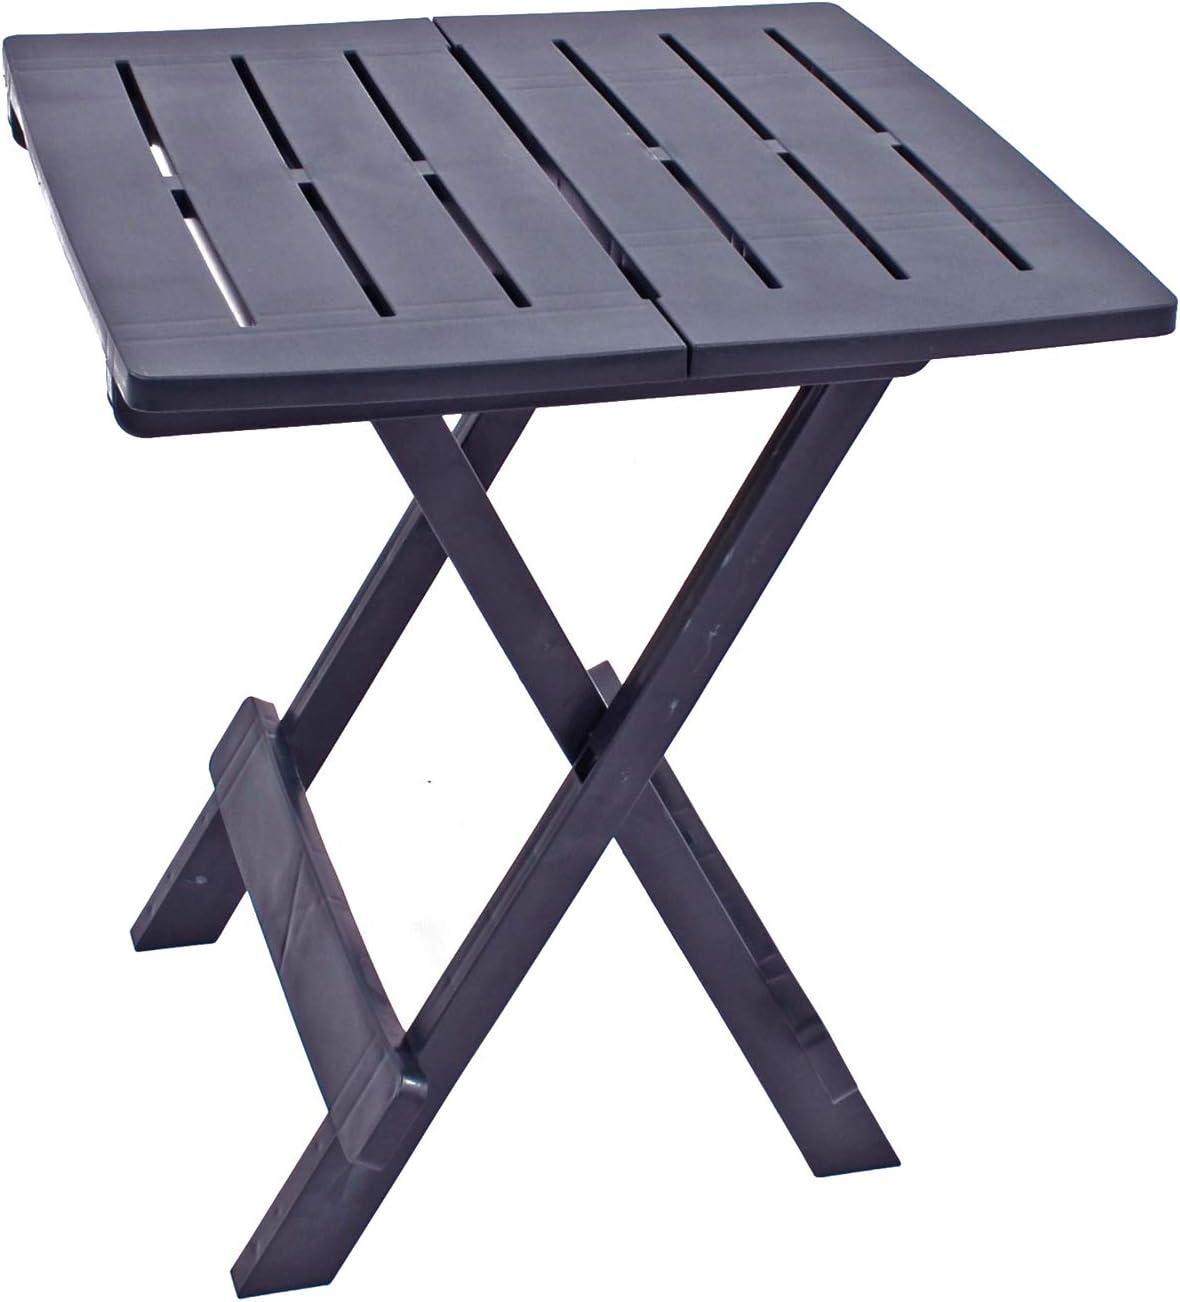 TRABELLA Anthracite BARI Side Table